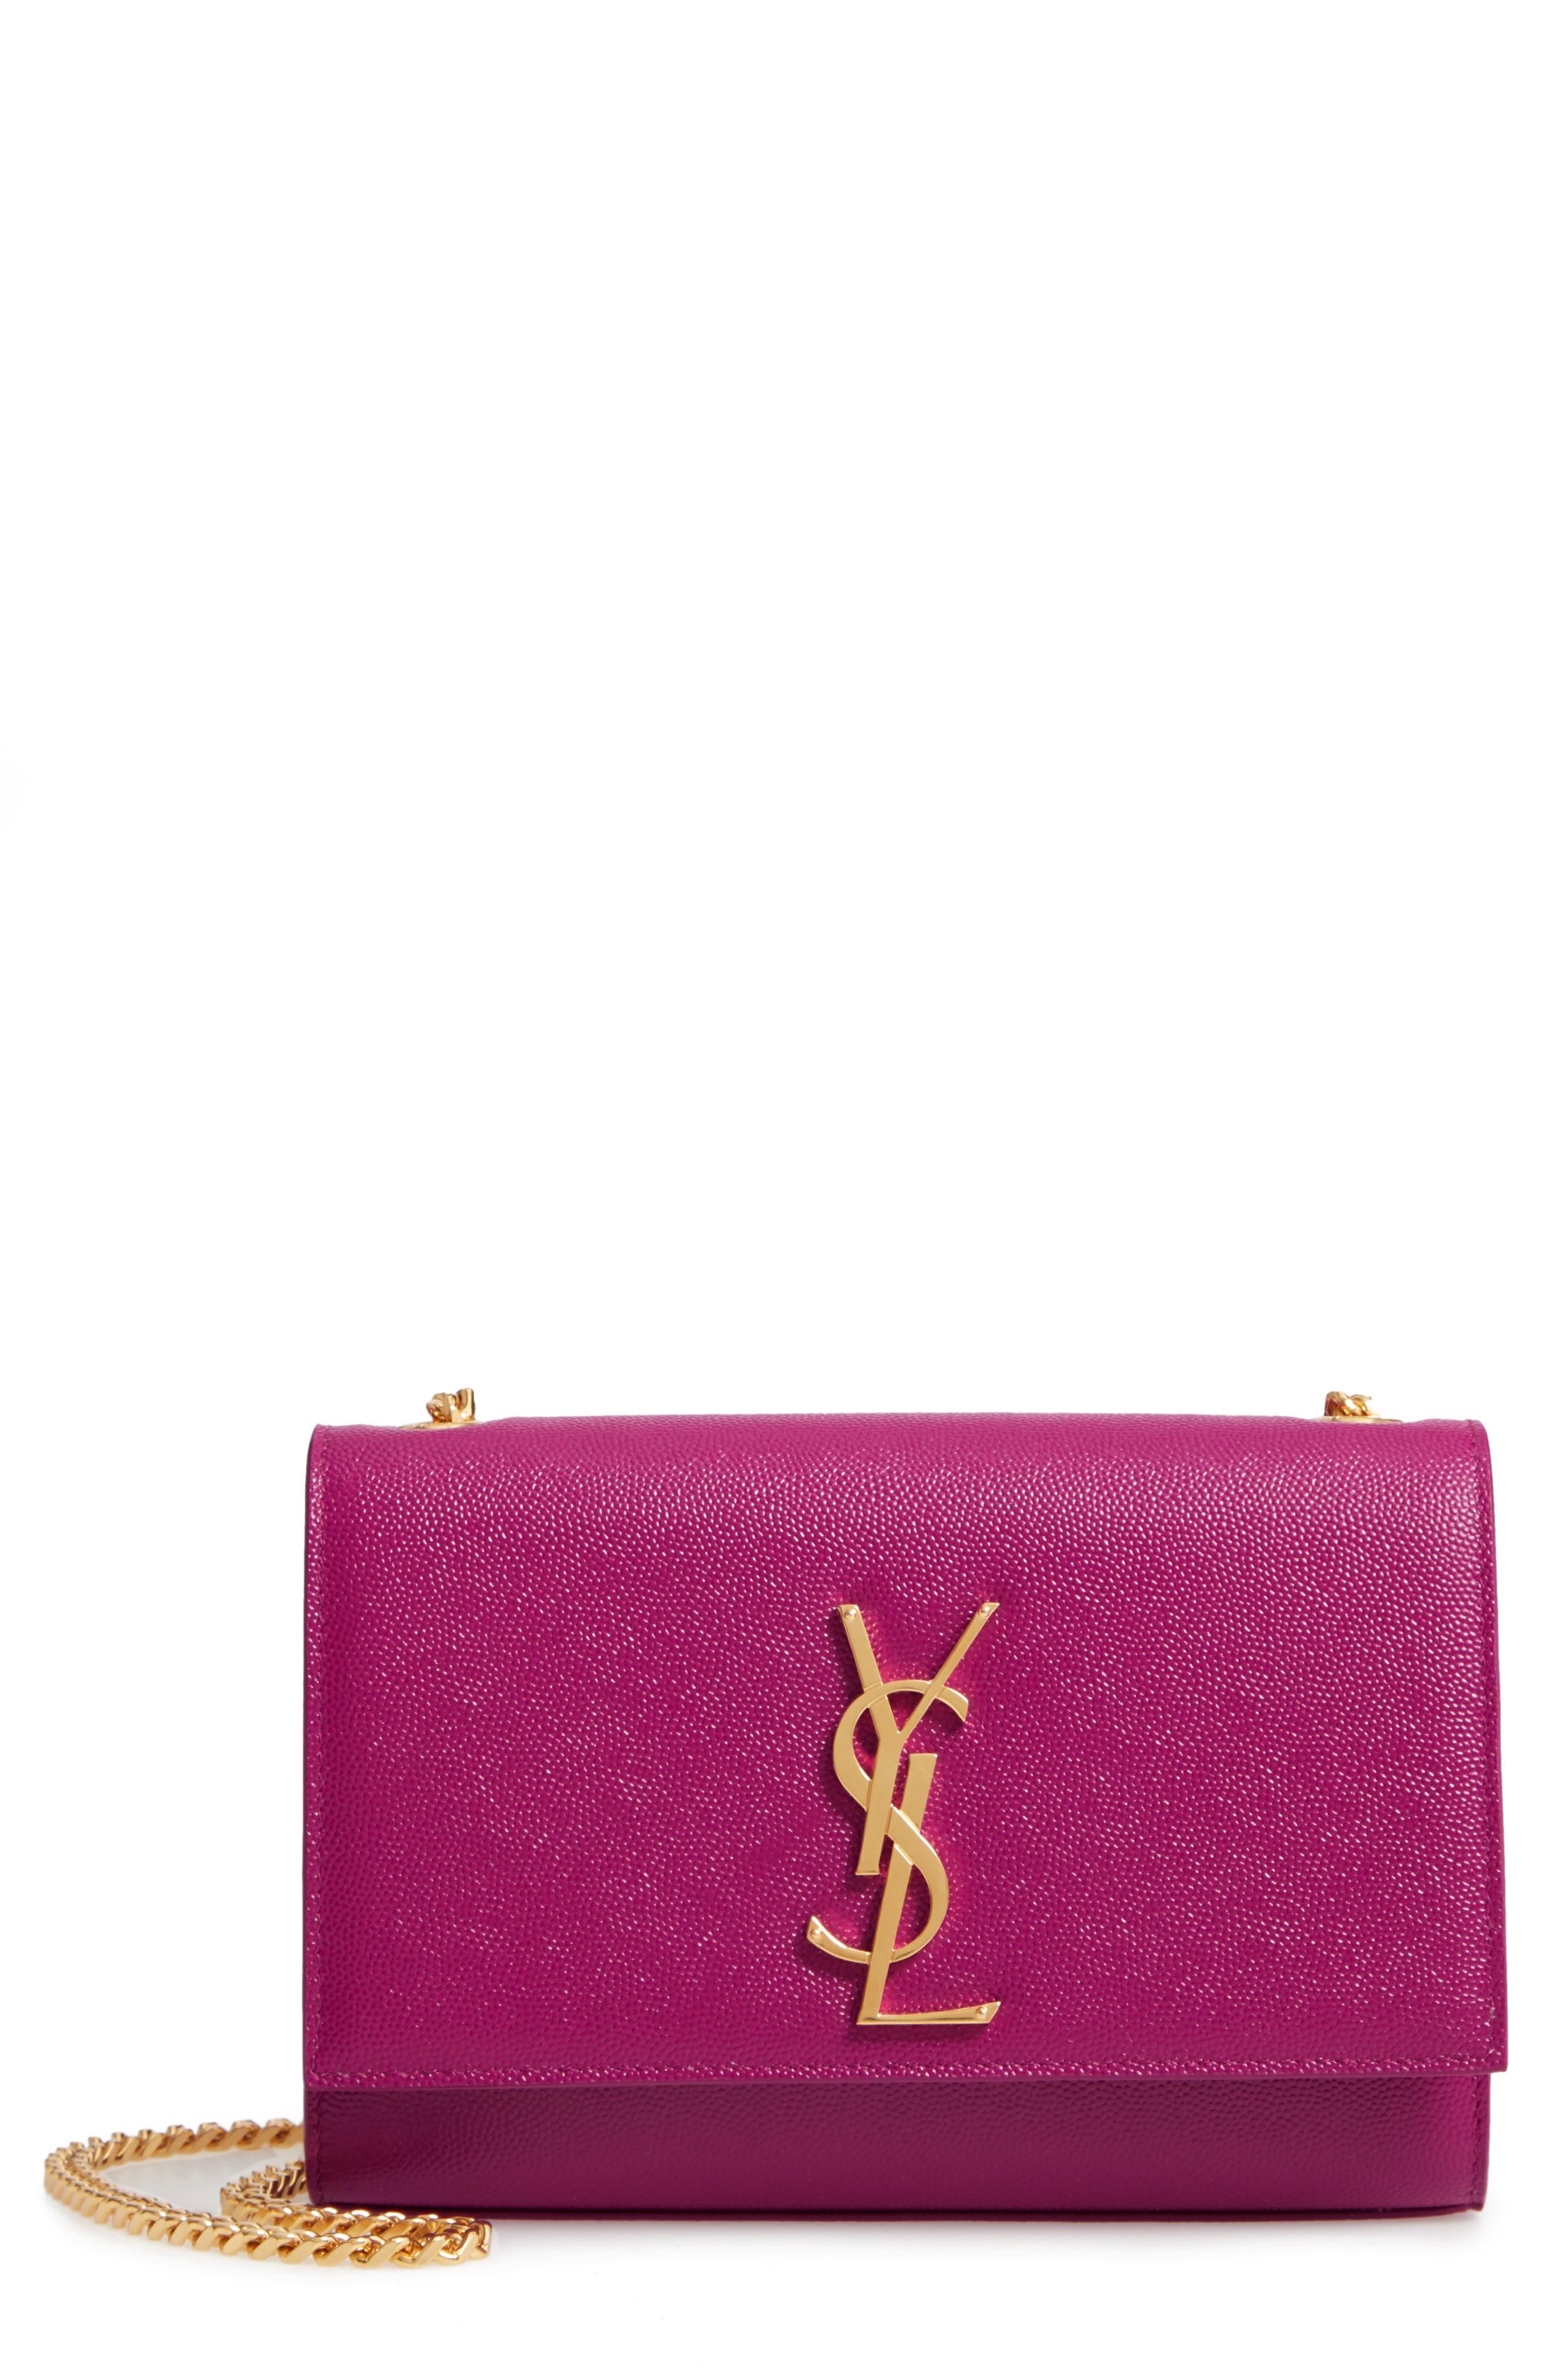 Small Kate Chain Crossbody Bag,                             Main thumbnail 1, color,                             LIGHT GRAPE